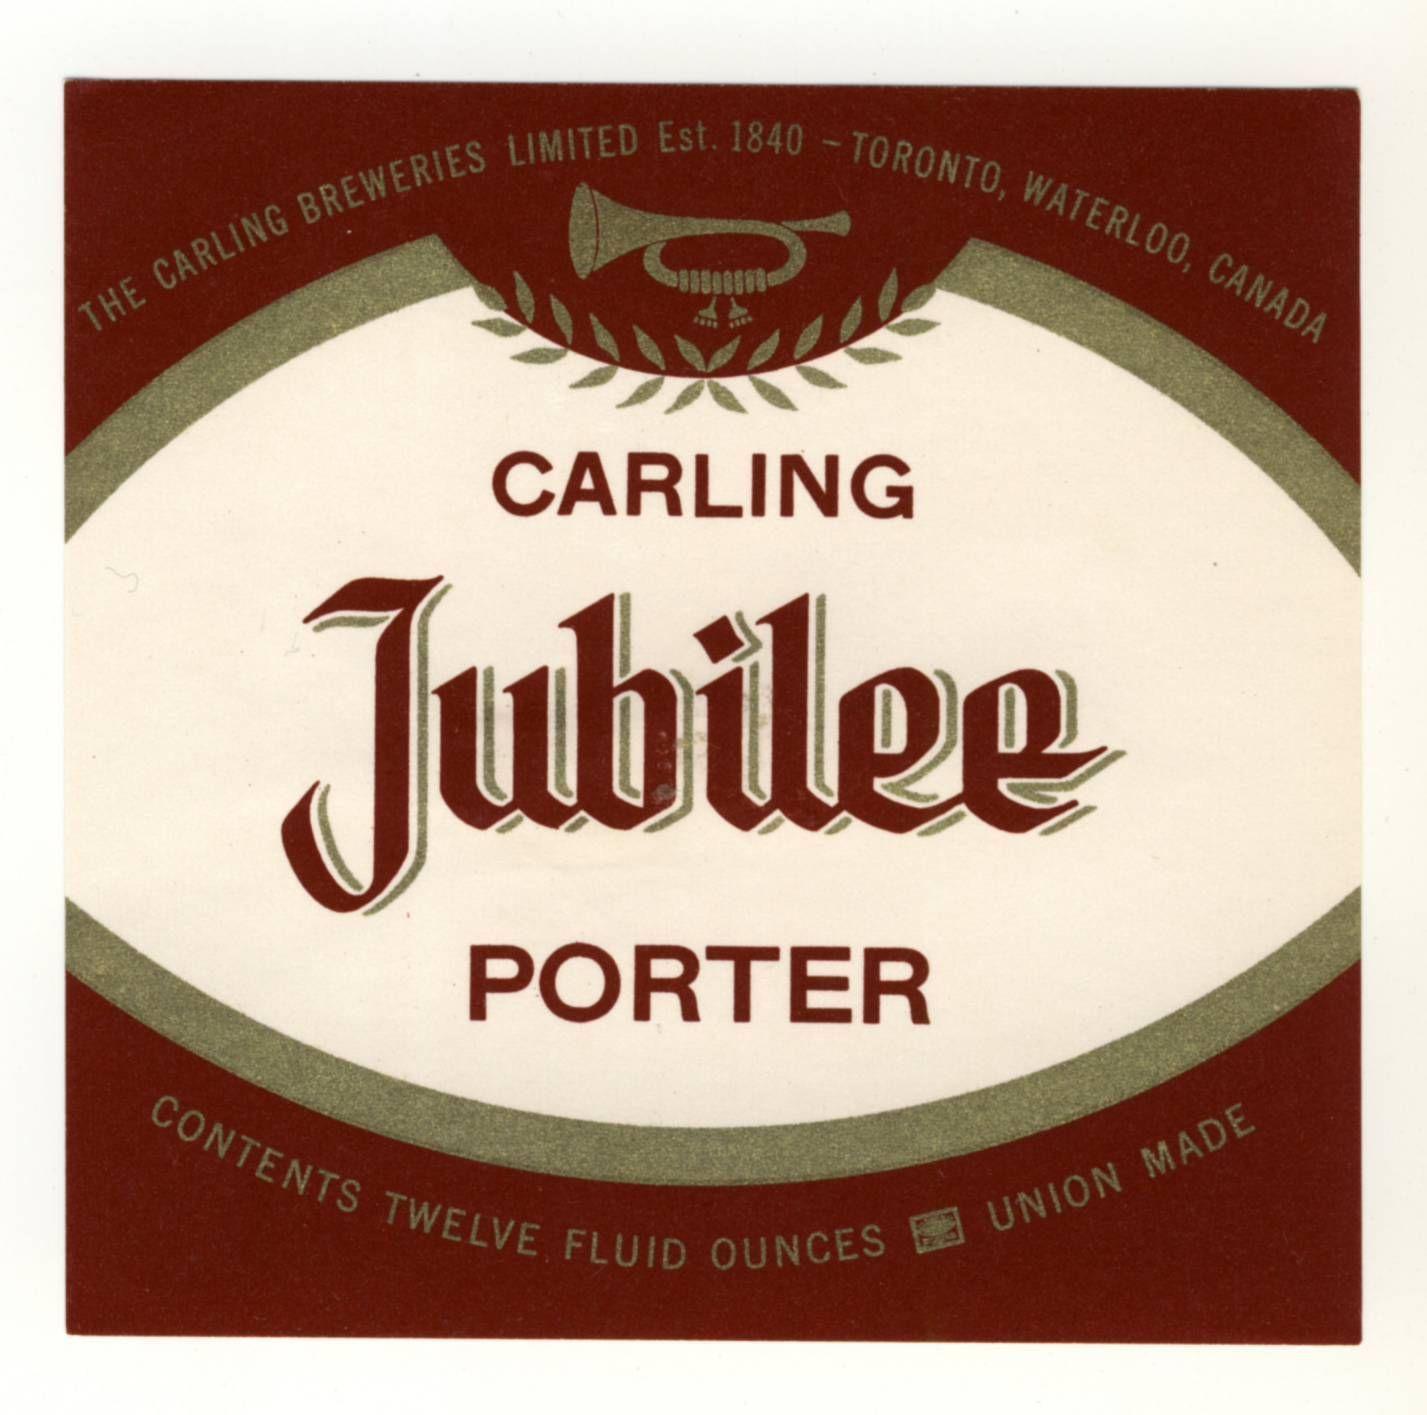 Jubilee Porter, made at the Carling Beer Factory in Waterloo ...